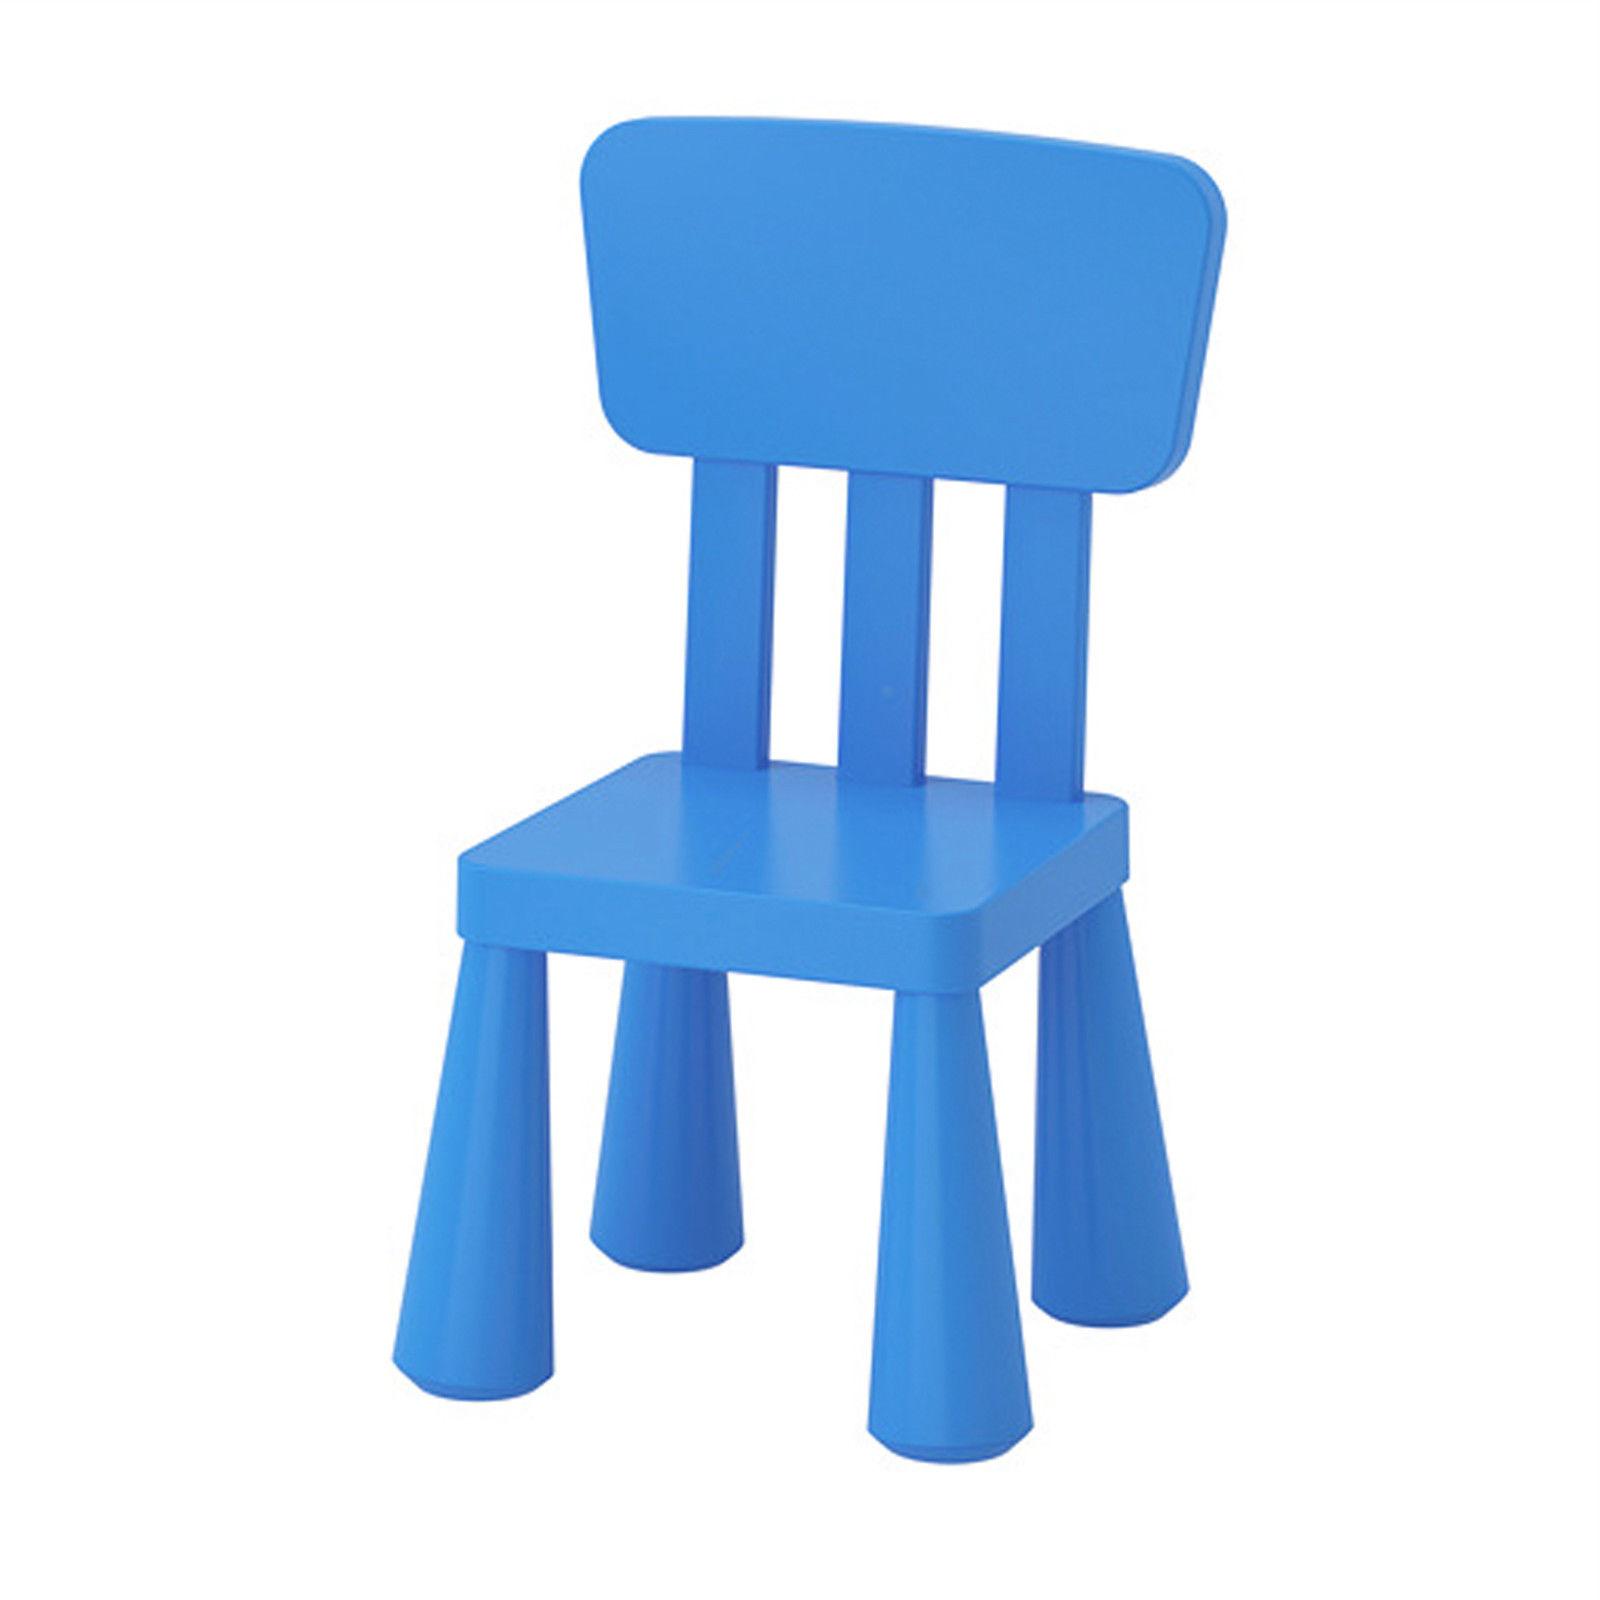 Ikea mammut kinderstuhl blau mit lehne sitz stuhl - Ikea mammut stuhl ...